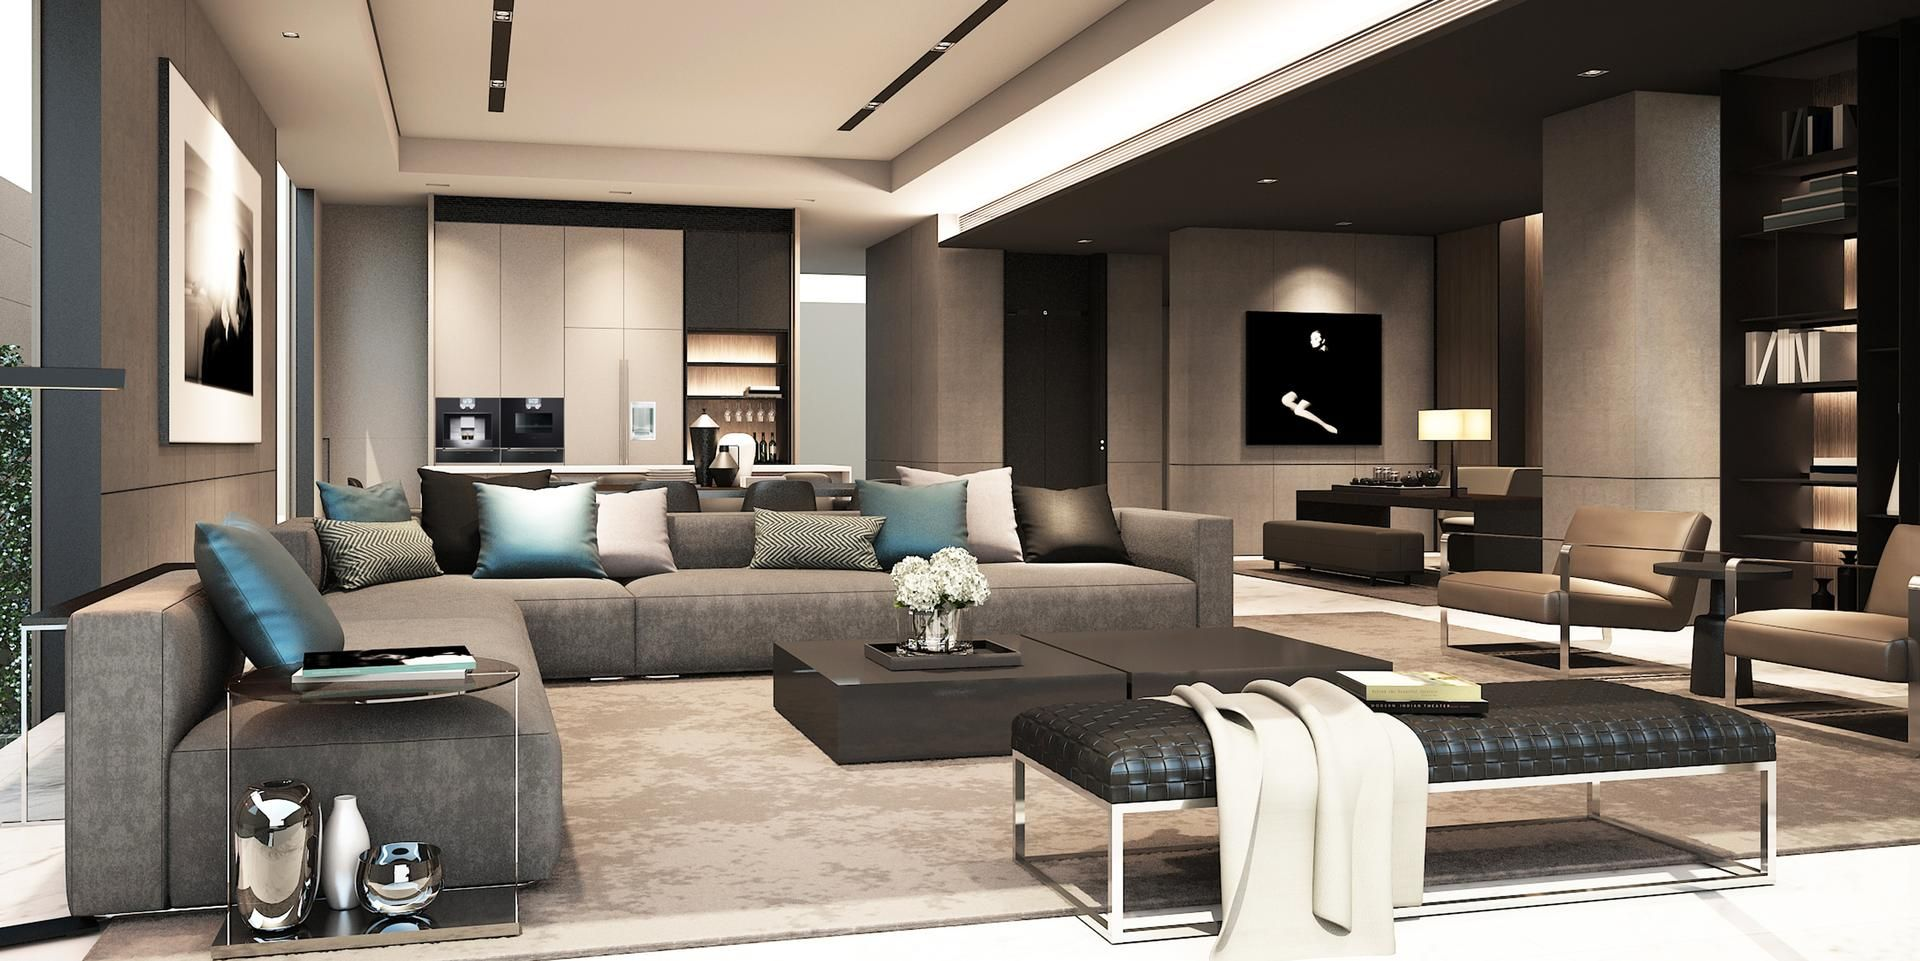 Http://www.scdaarchitects.com/interiors/sanya Villas